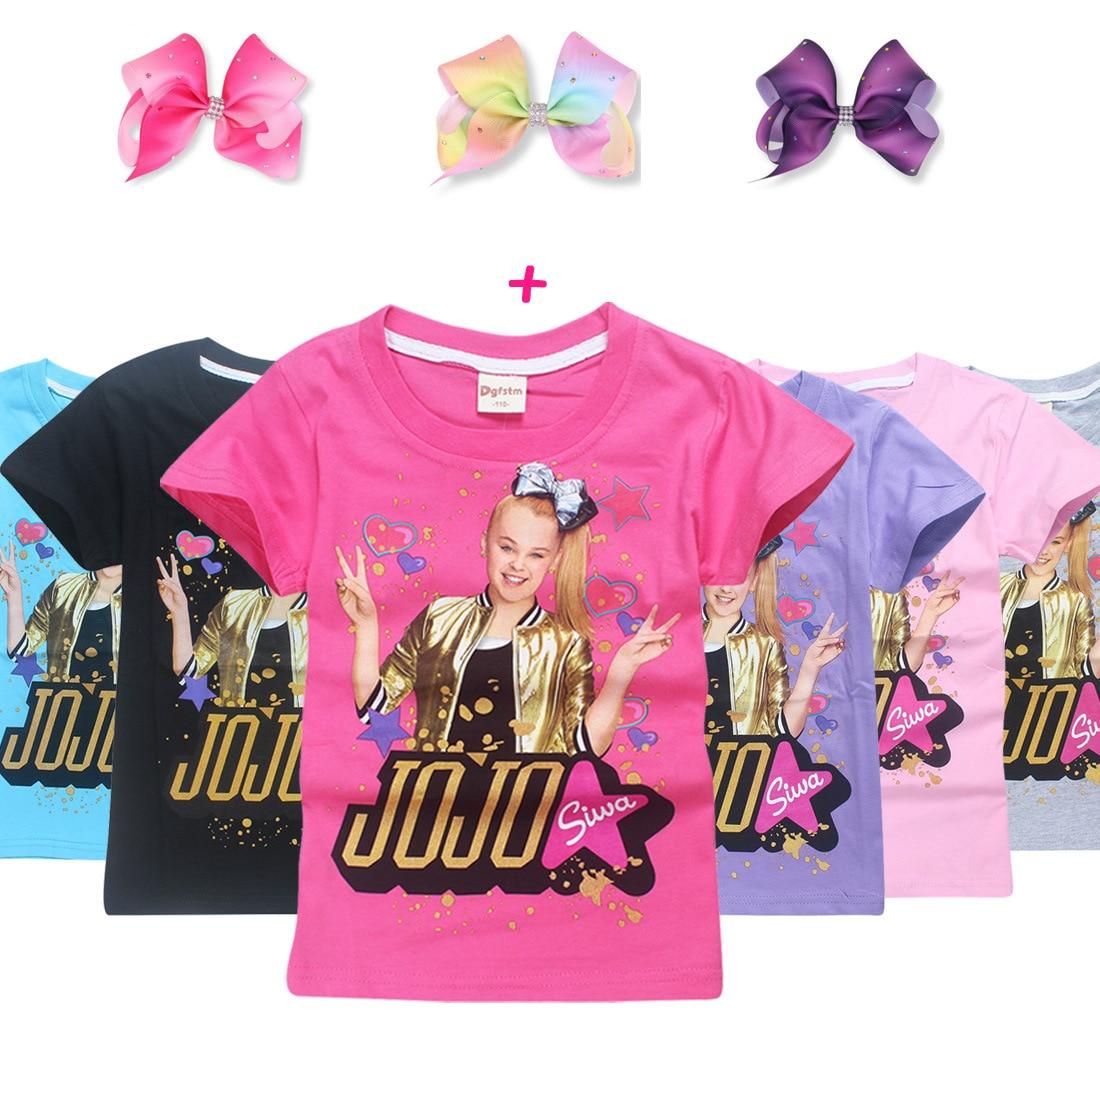 Boys Clothing Tshirt Tops Short-Sleeve Jojo Siwa Cartoon Children Summer Cotton Girls